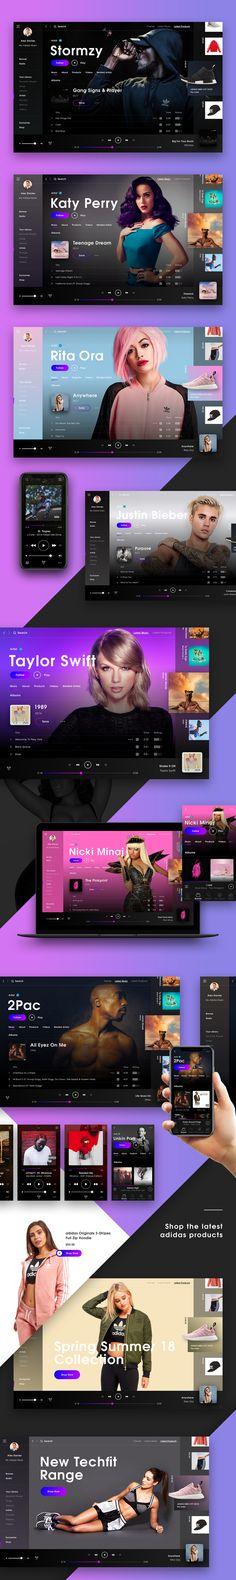 Adidas Music Concept on Behance